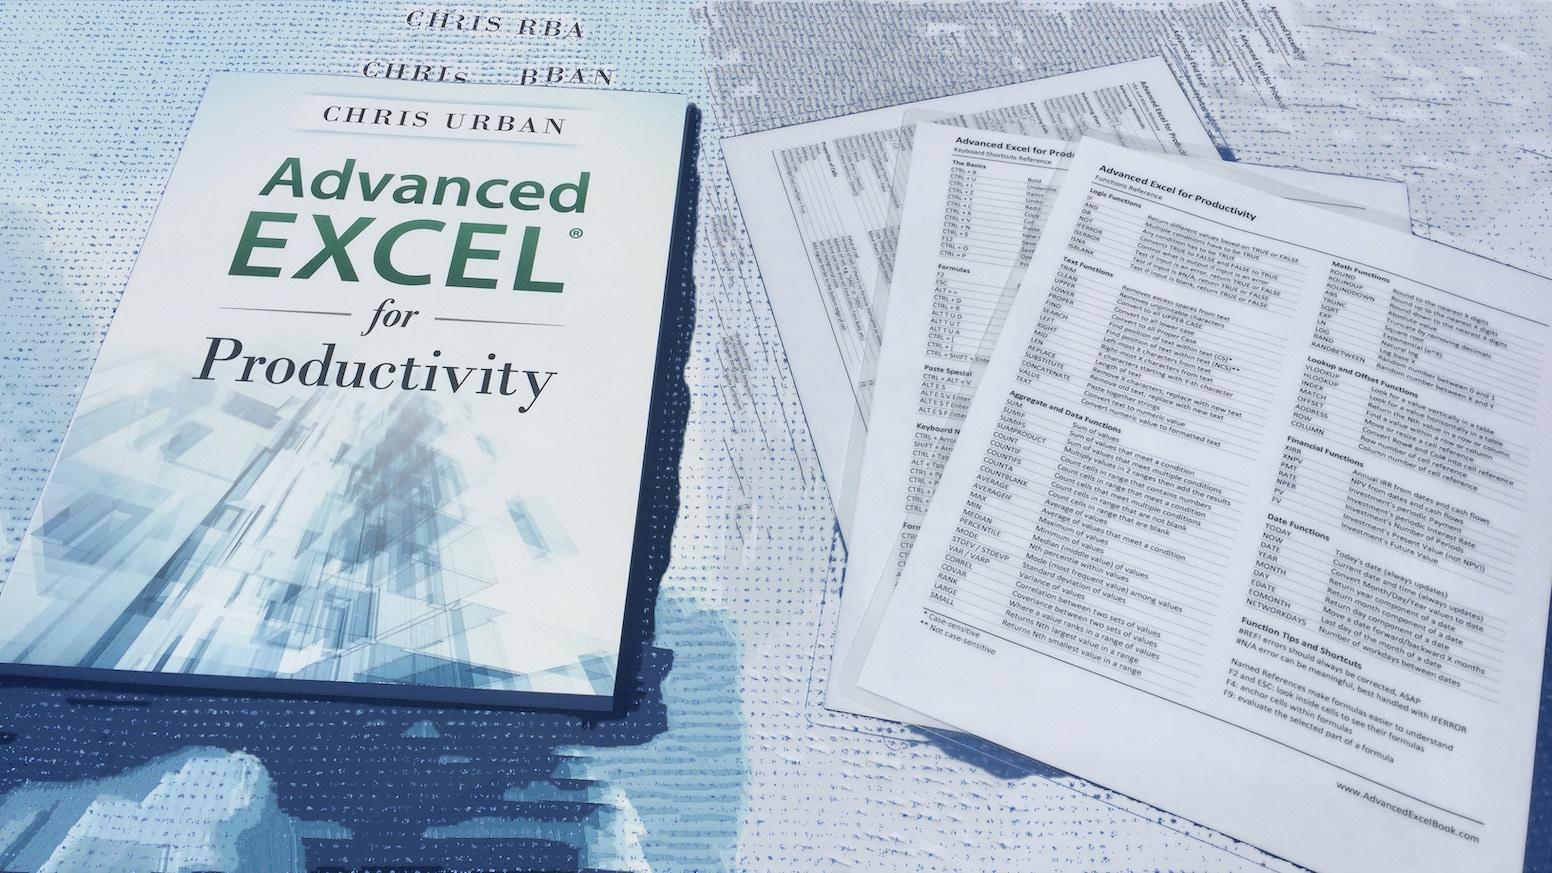 advanced excel book by chris urban kickstarter